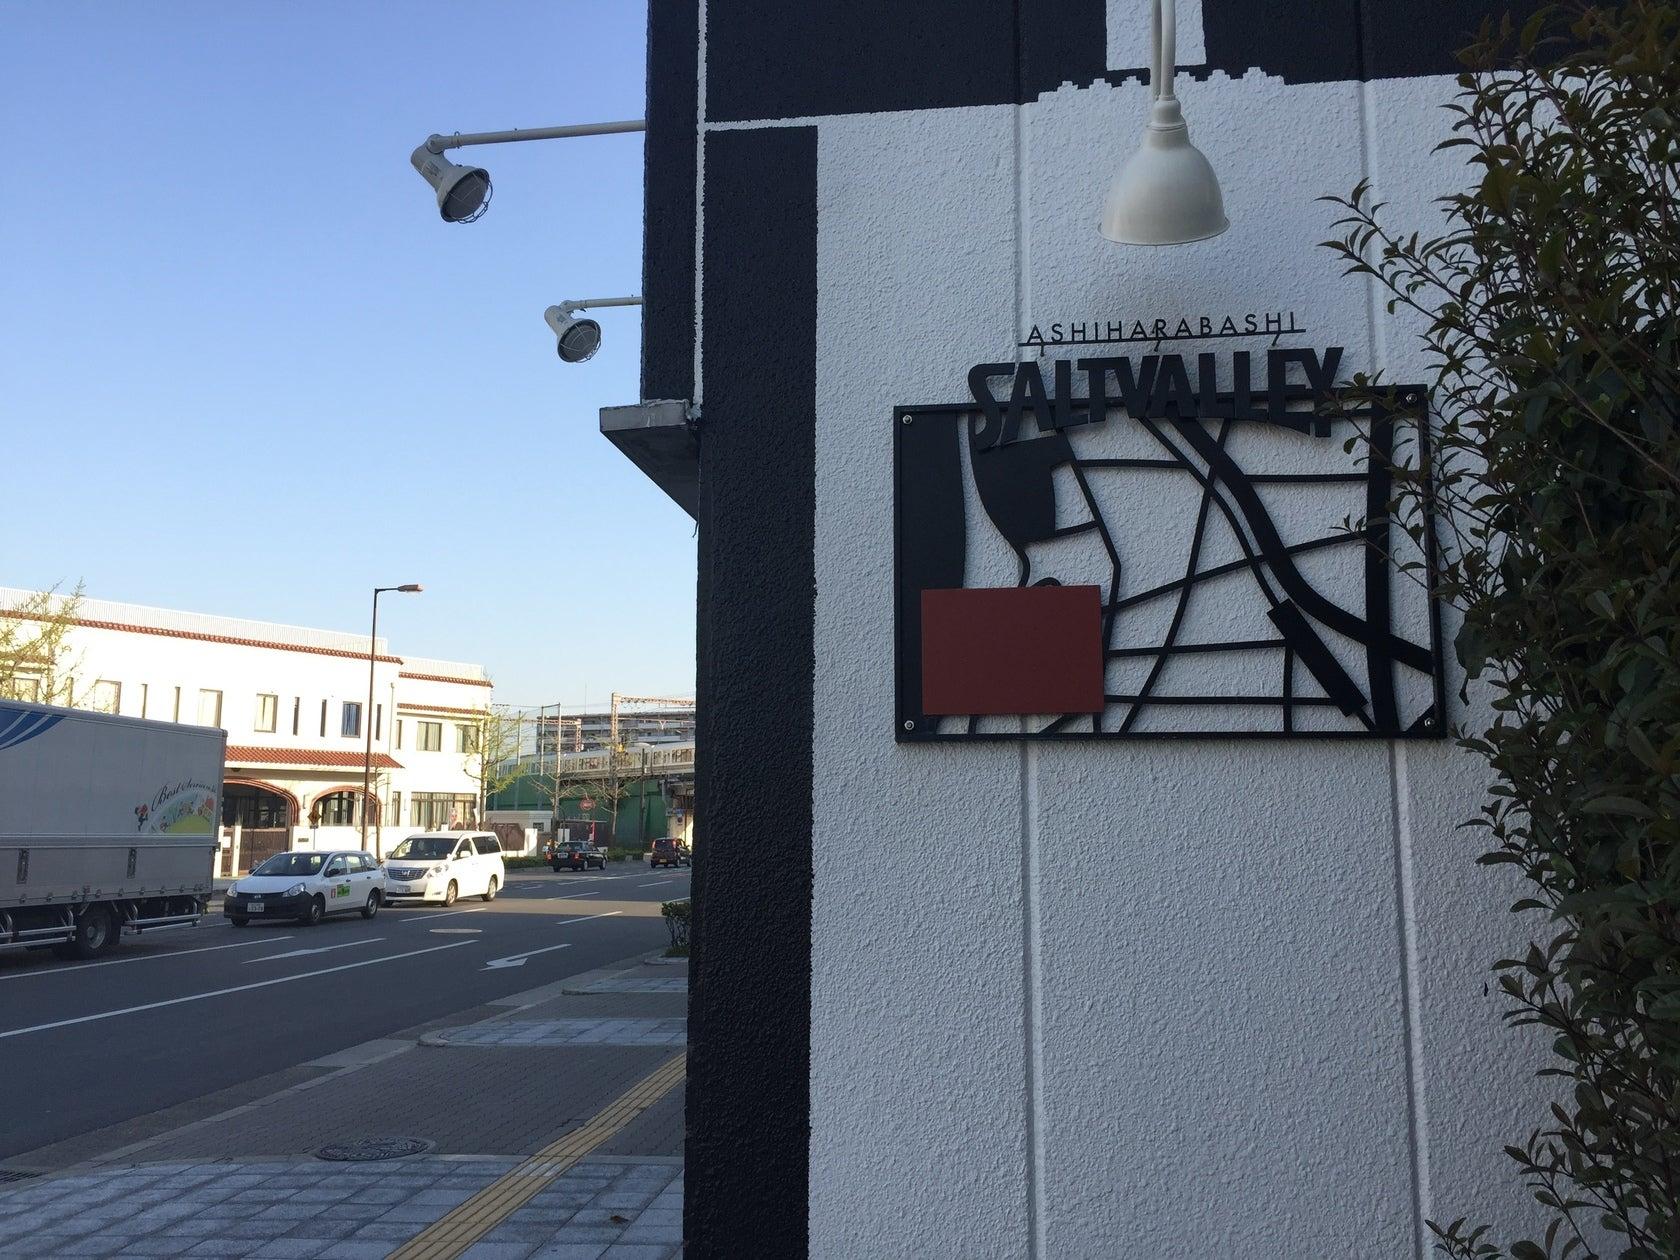 JR大阪環状線「芦原橋駅」1分まるまる貸切!ボタニカルガーデン利用可 の写真